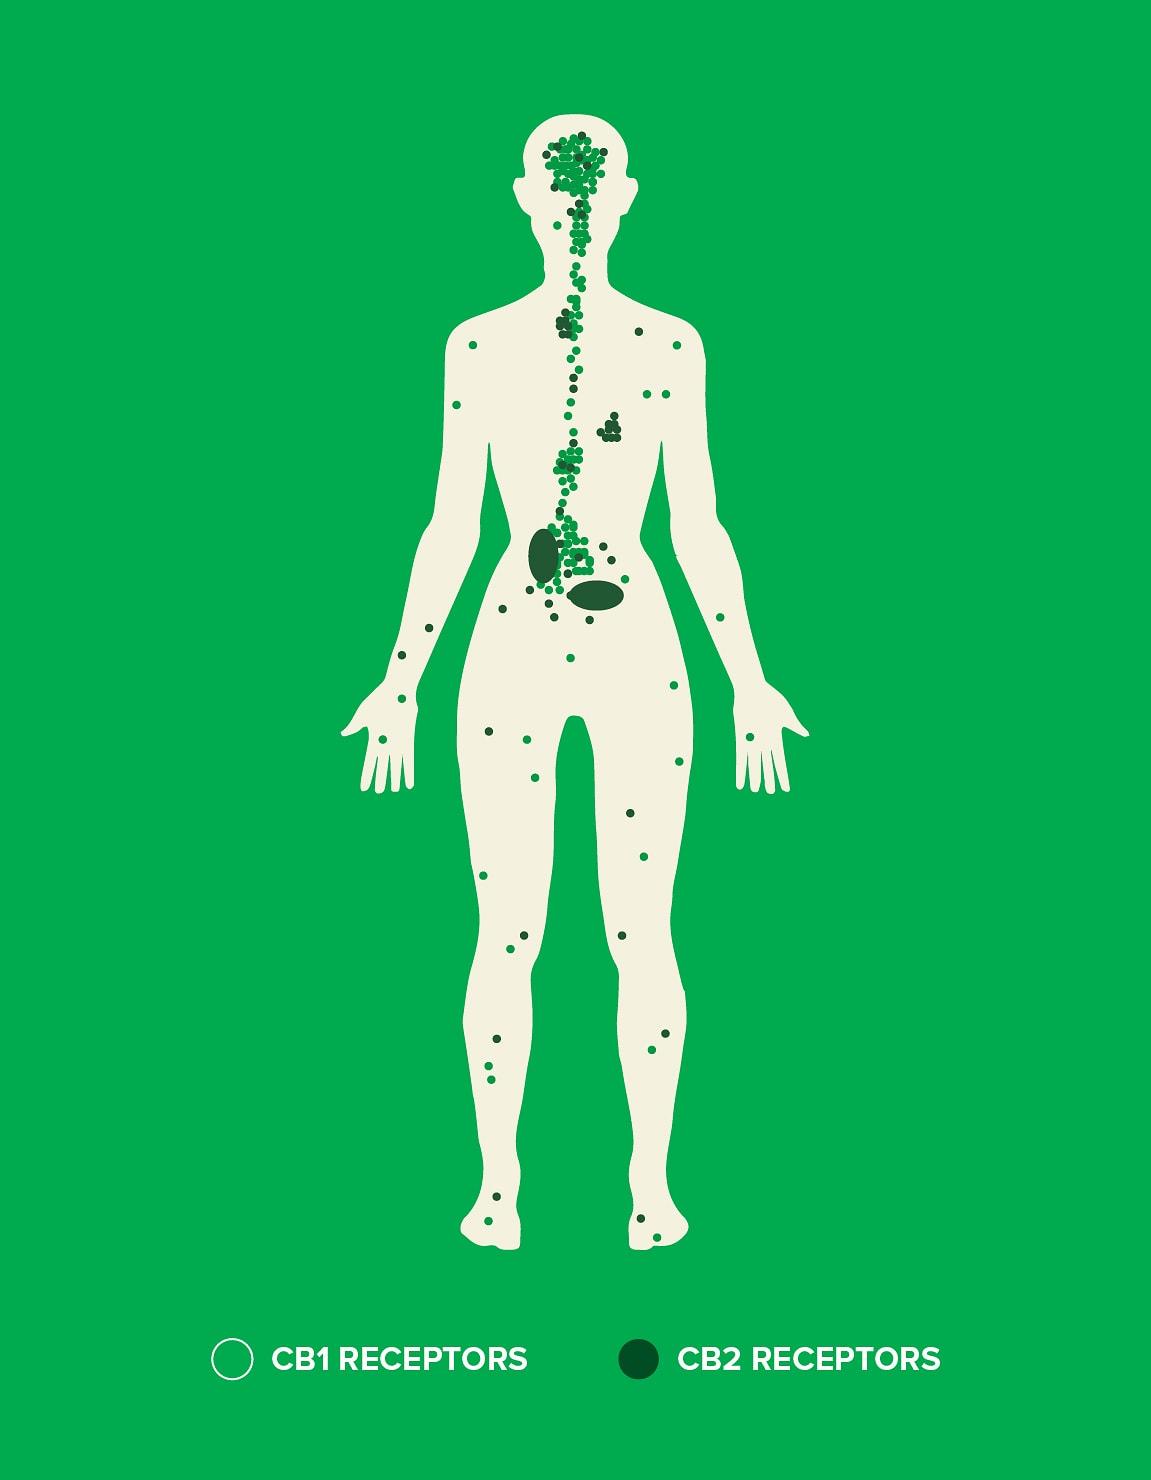 How CBD & the endocannabinoid system works